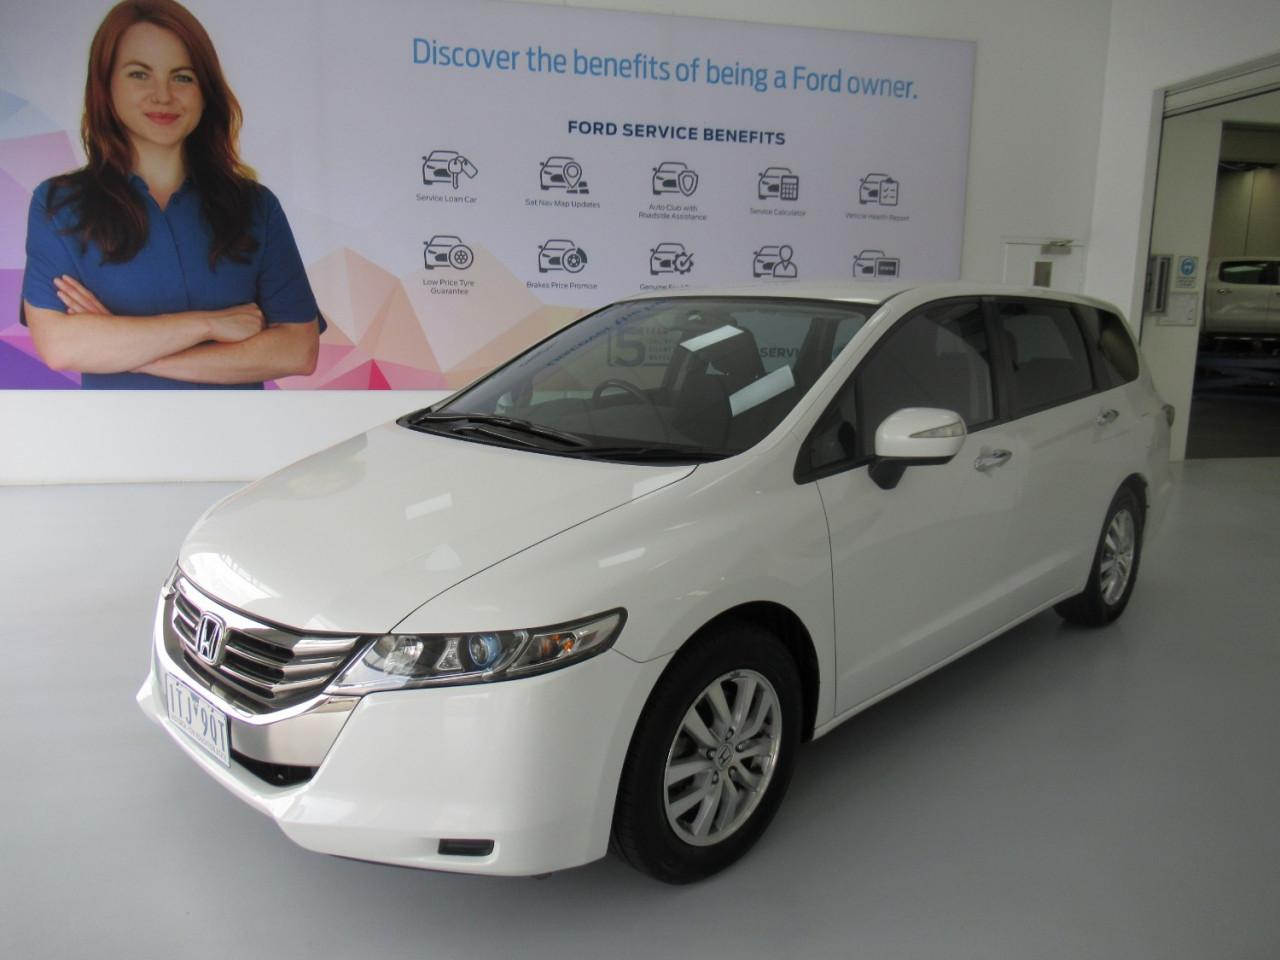 2013 Honda Odyssey 4TH GEN MY13 Wagon Image 1